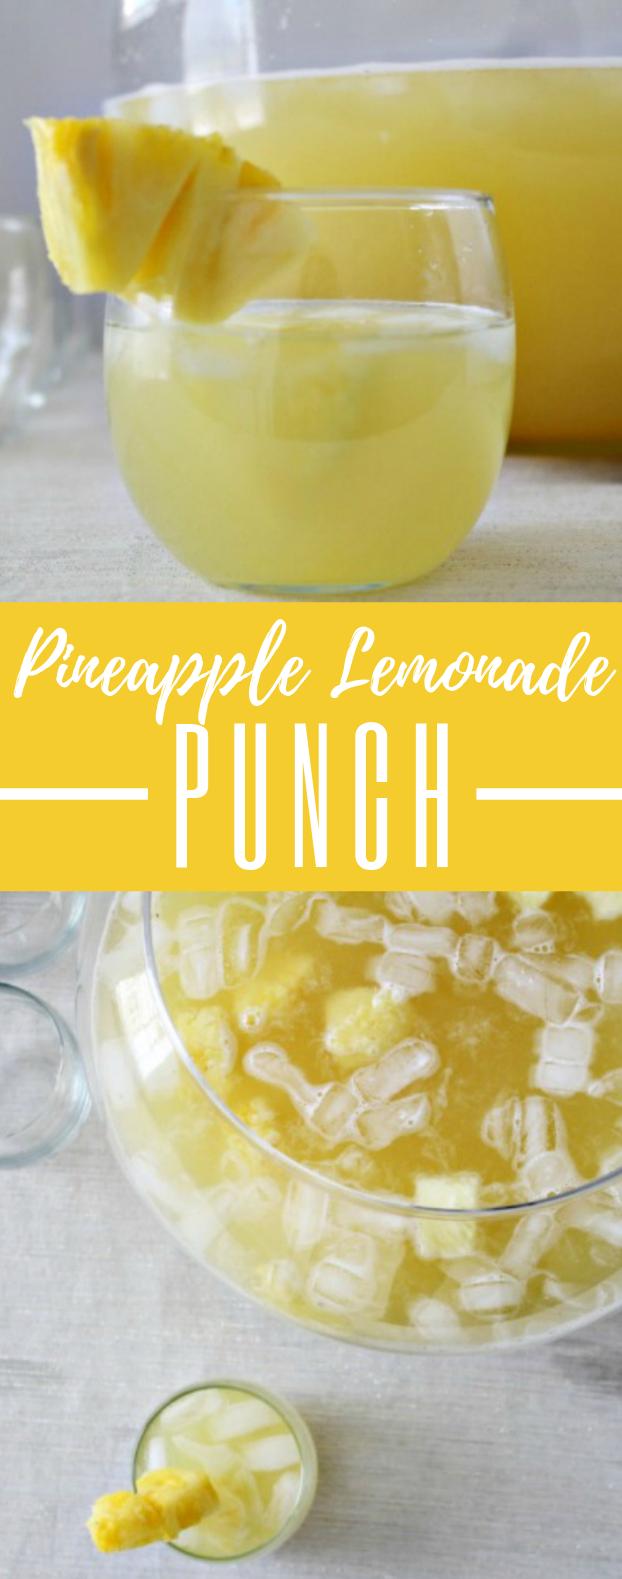 Pineapple Beverages